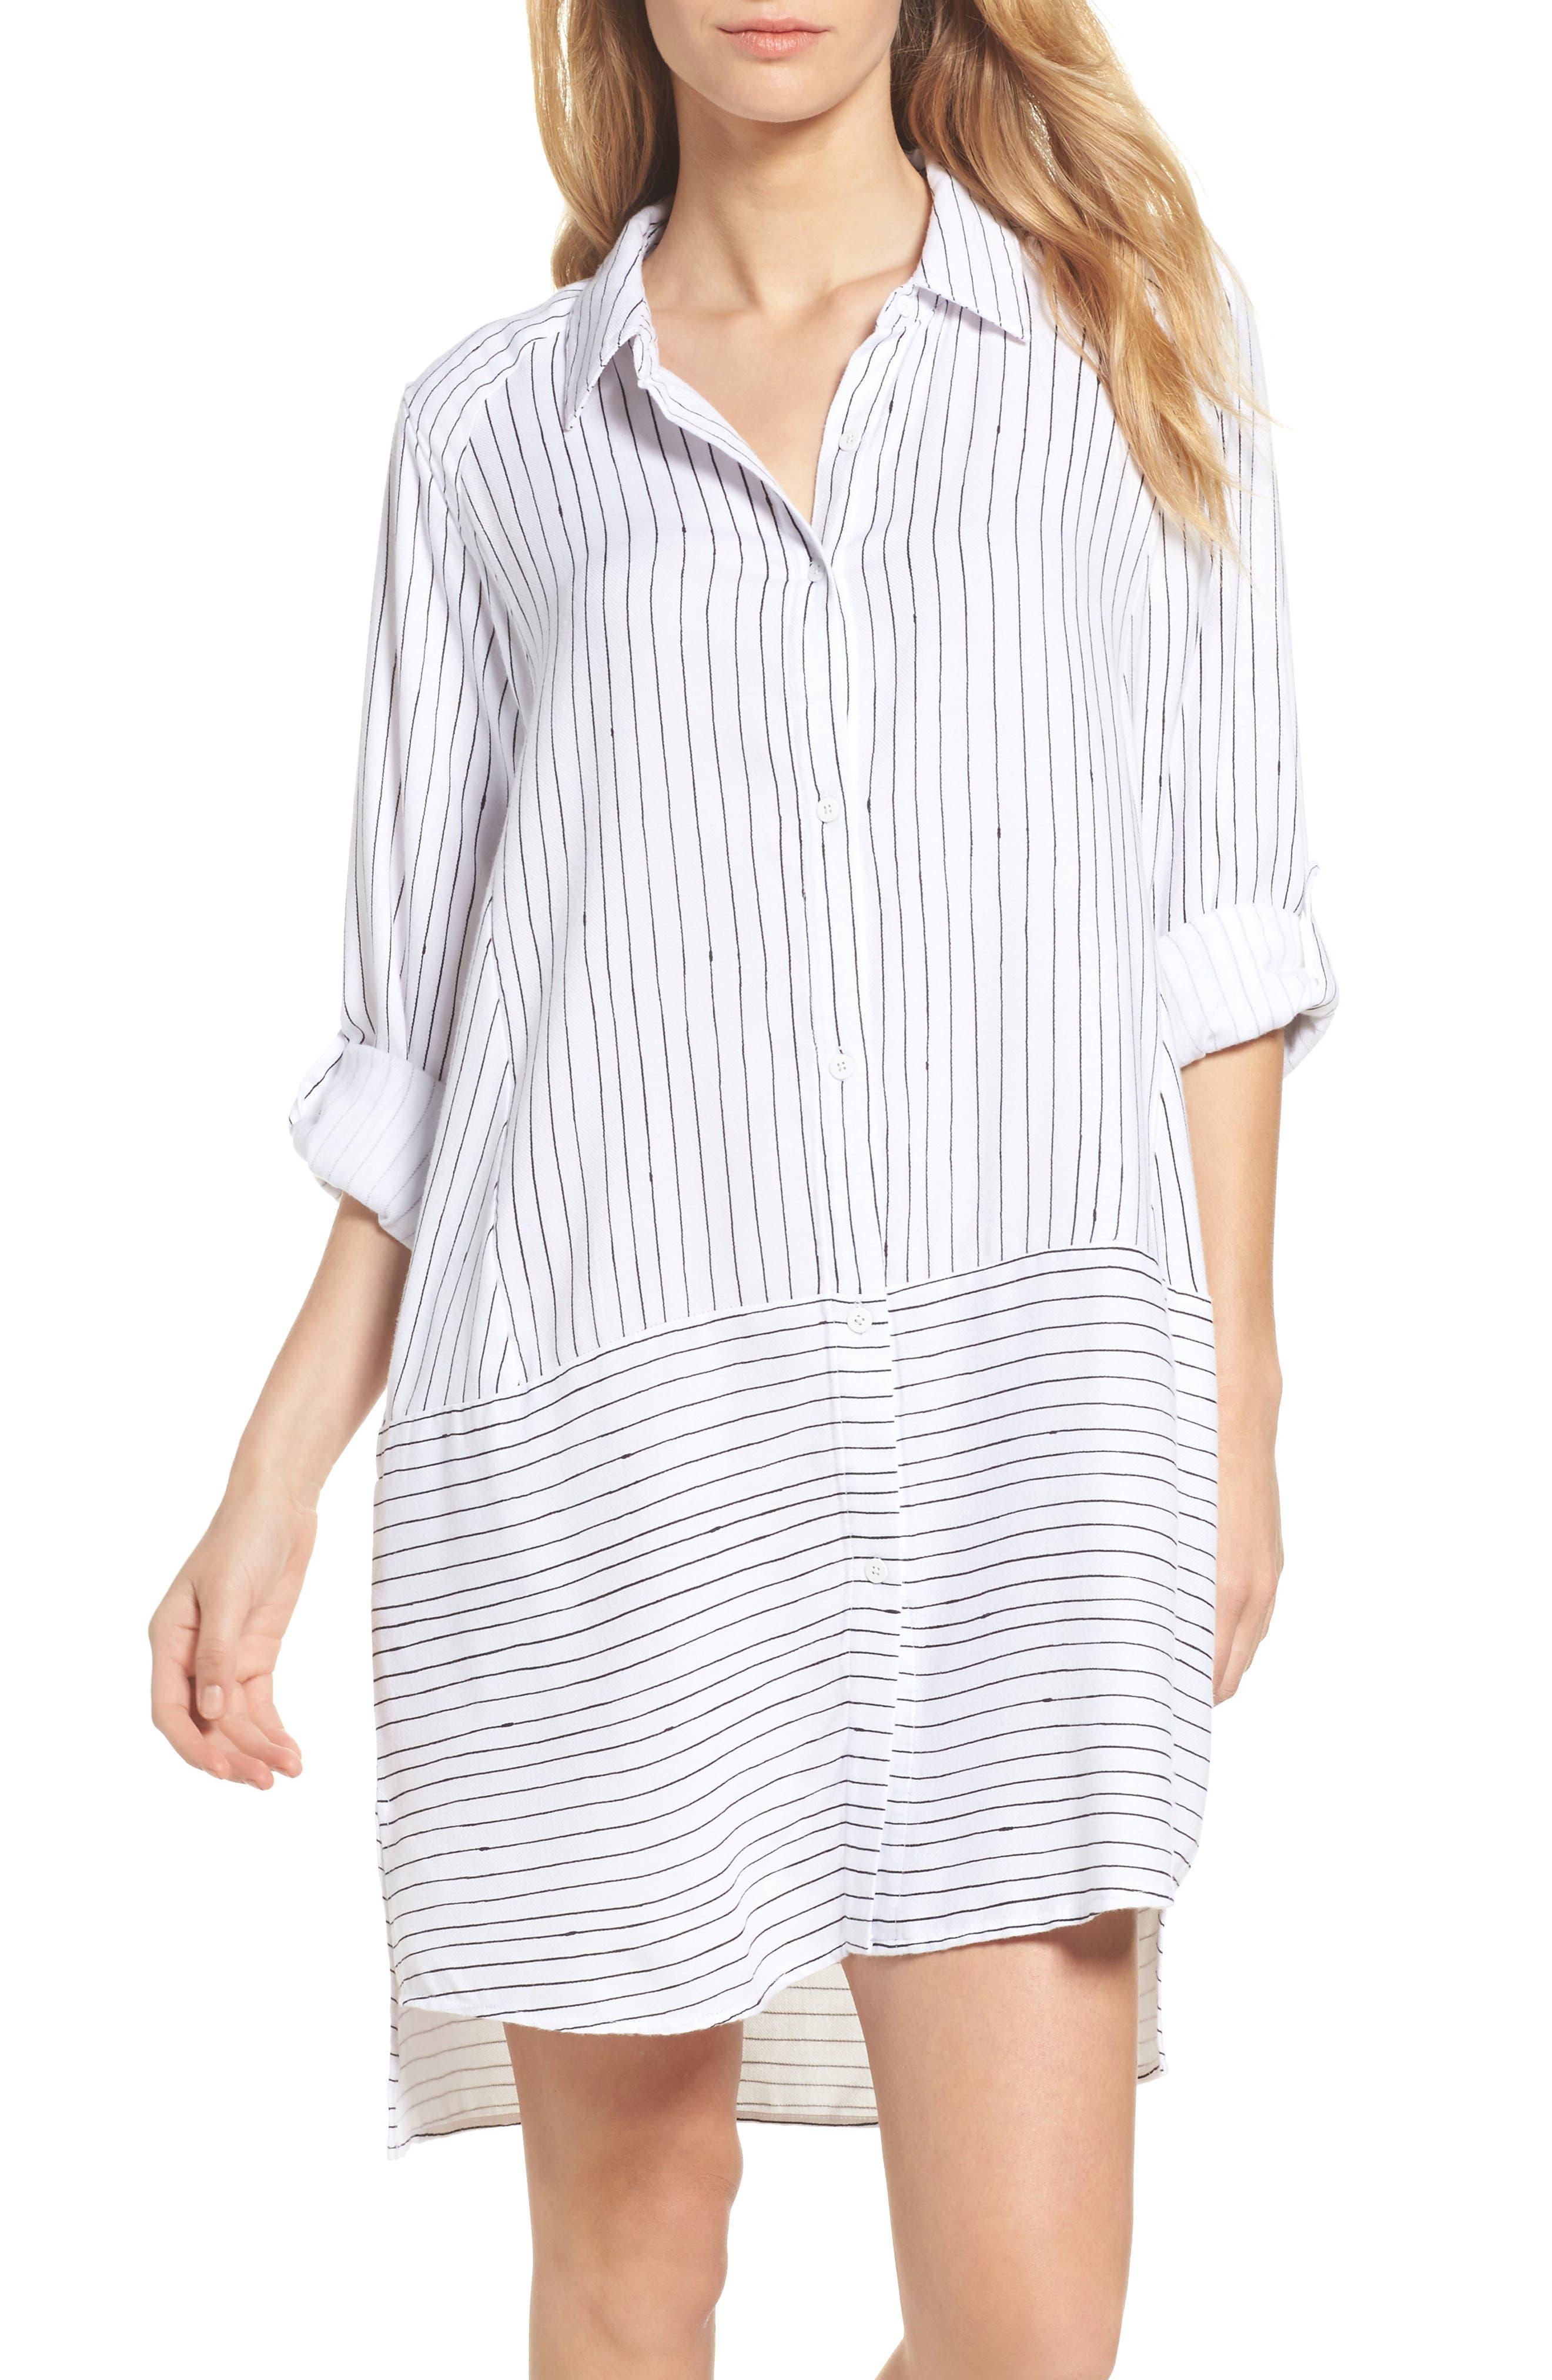 Stripe Sleep Shirt,                         Main,                         color, White Stripe Print